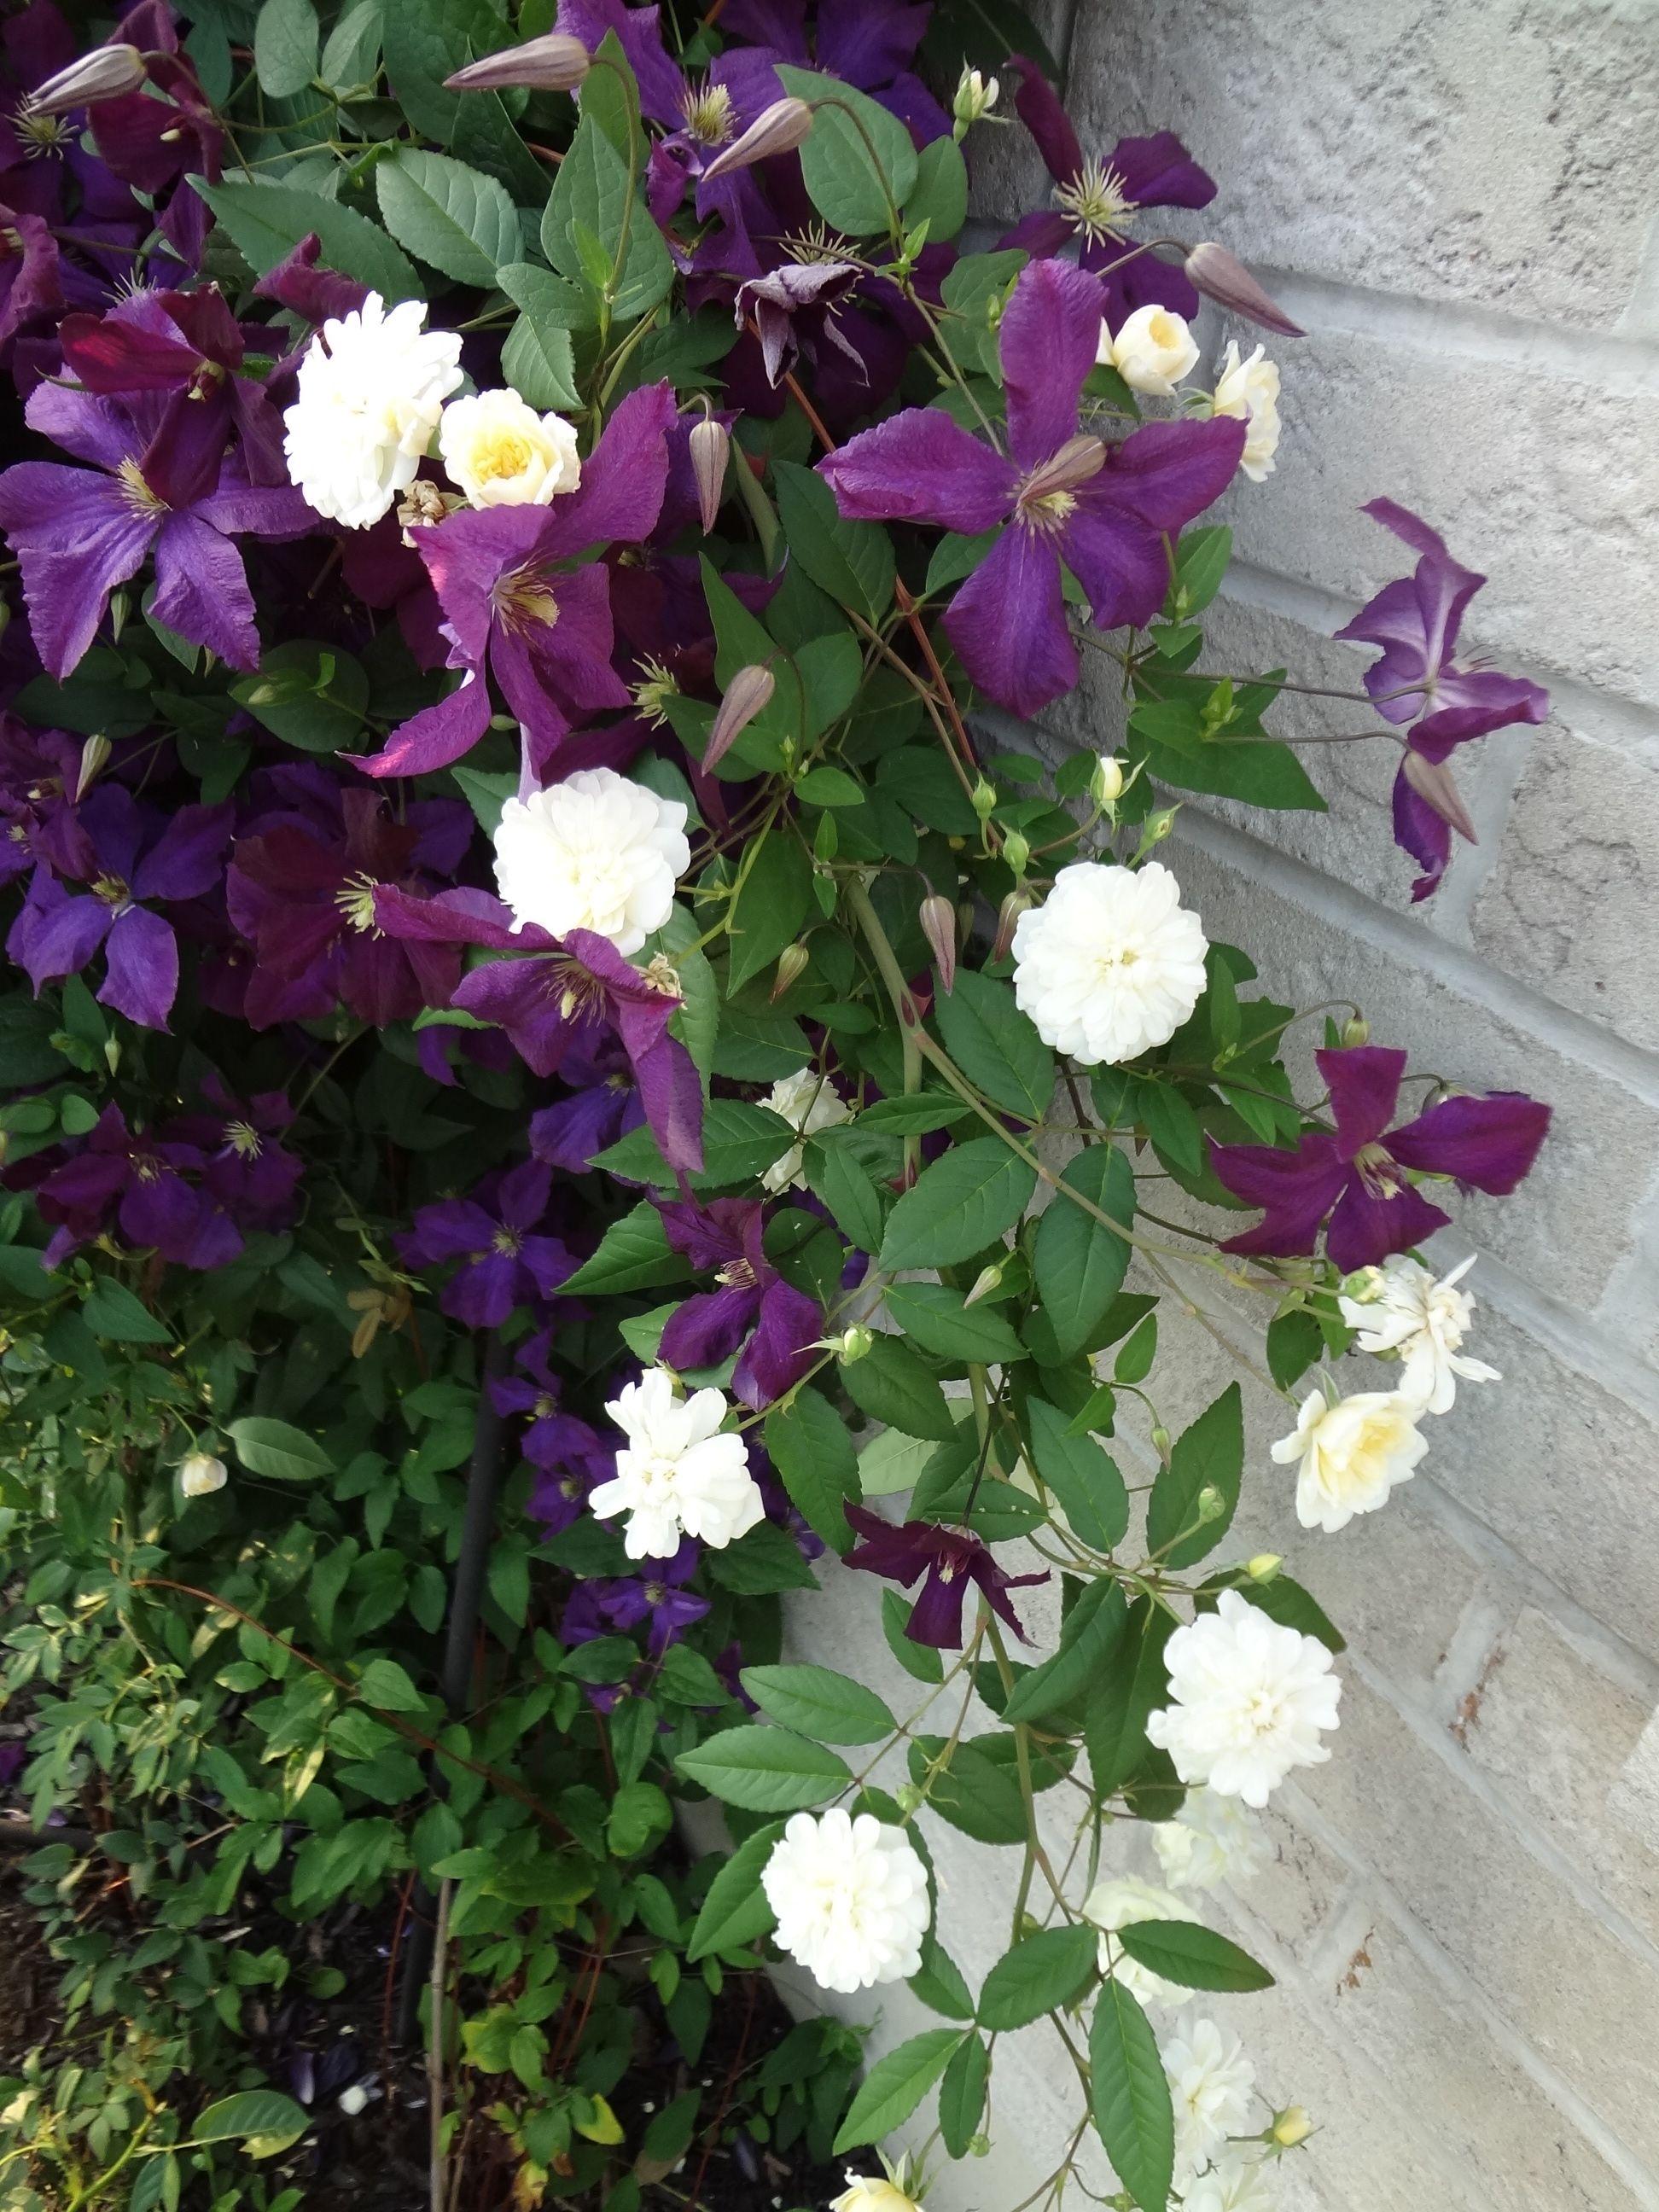 malvern hills rose and clematis etoile violette rose gardening